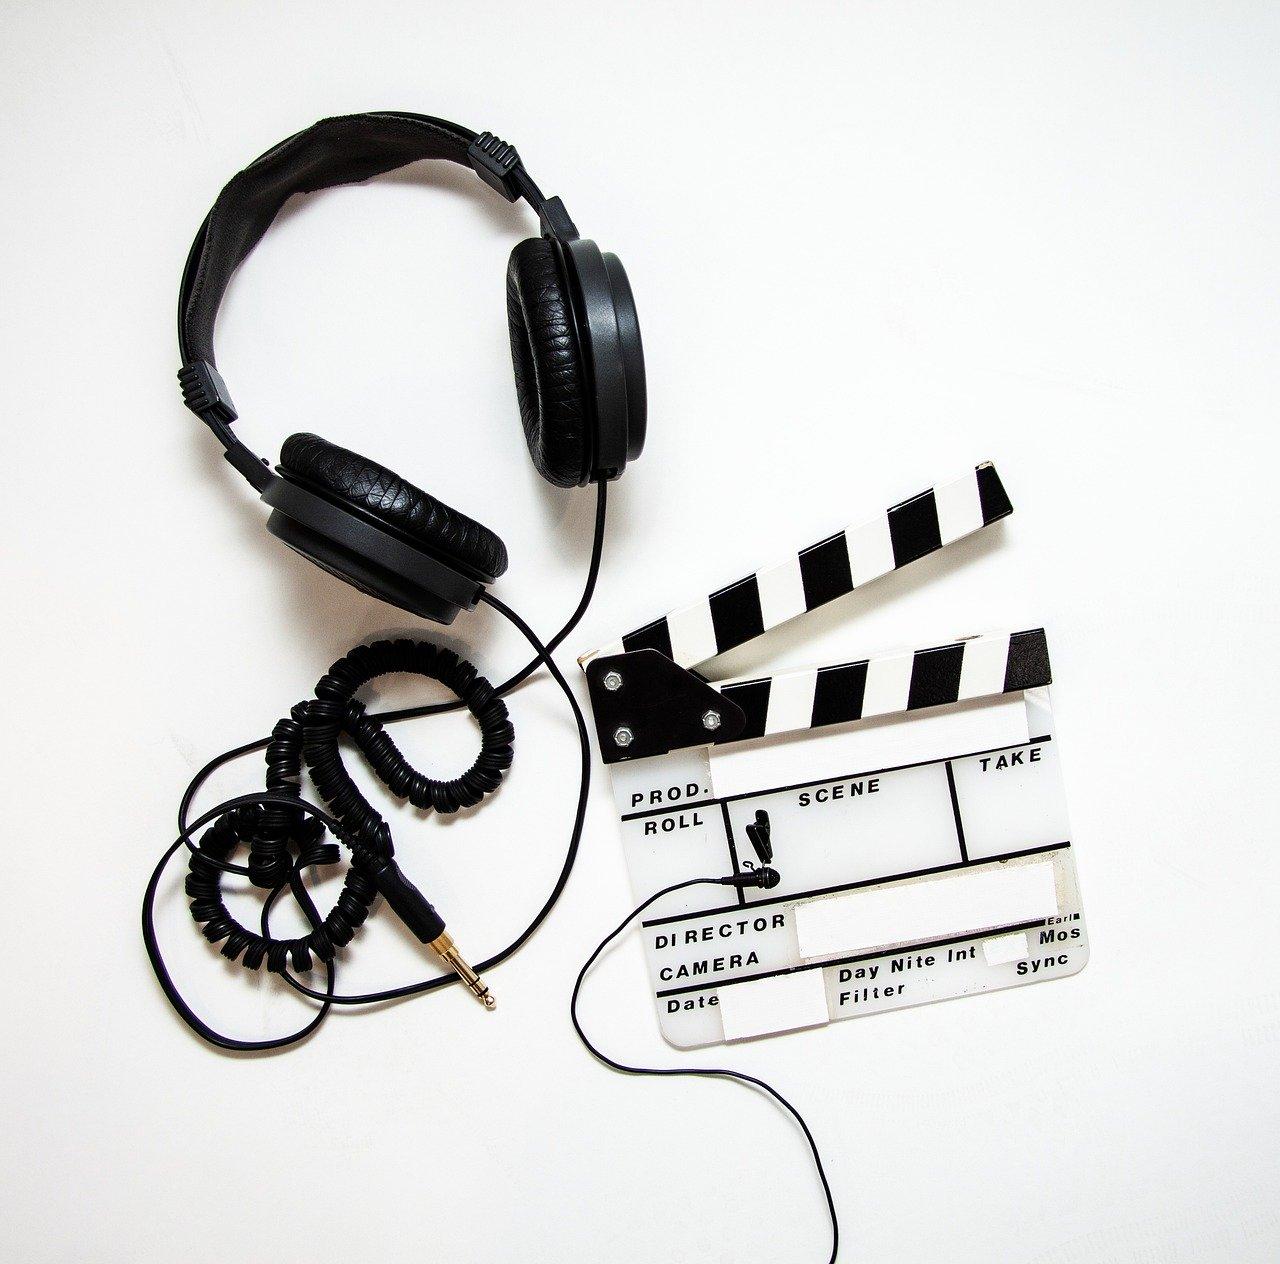 headphones, clapper, clapperboard